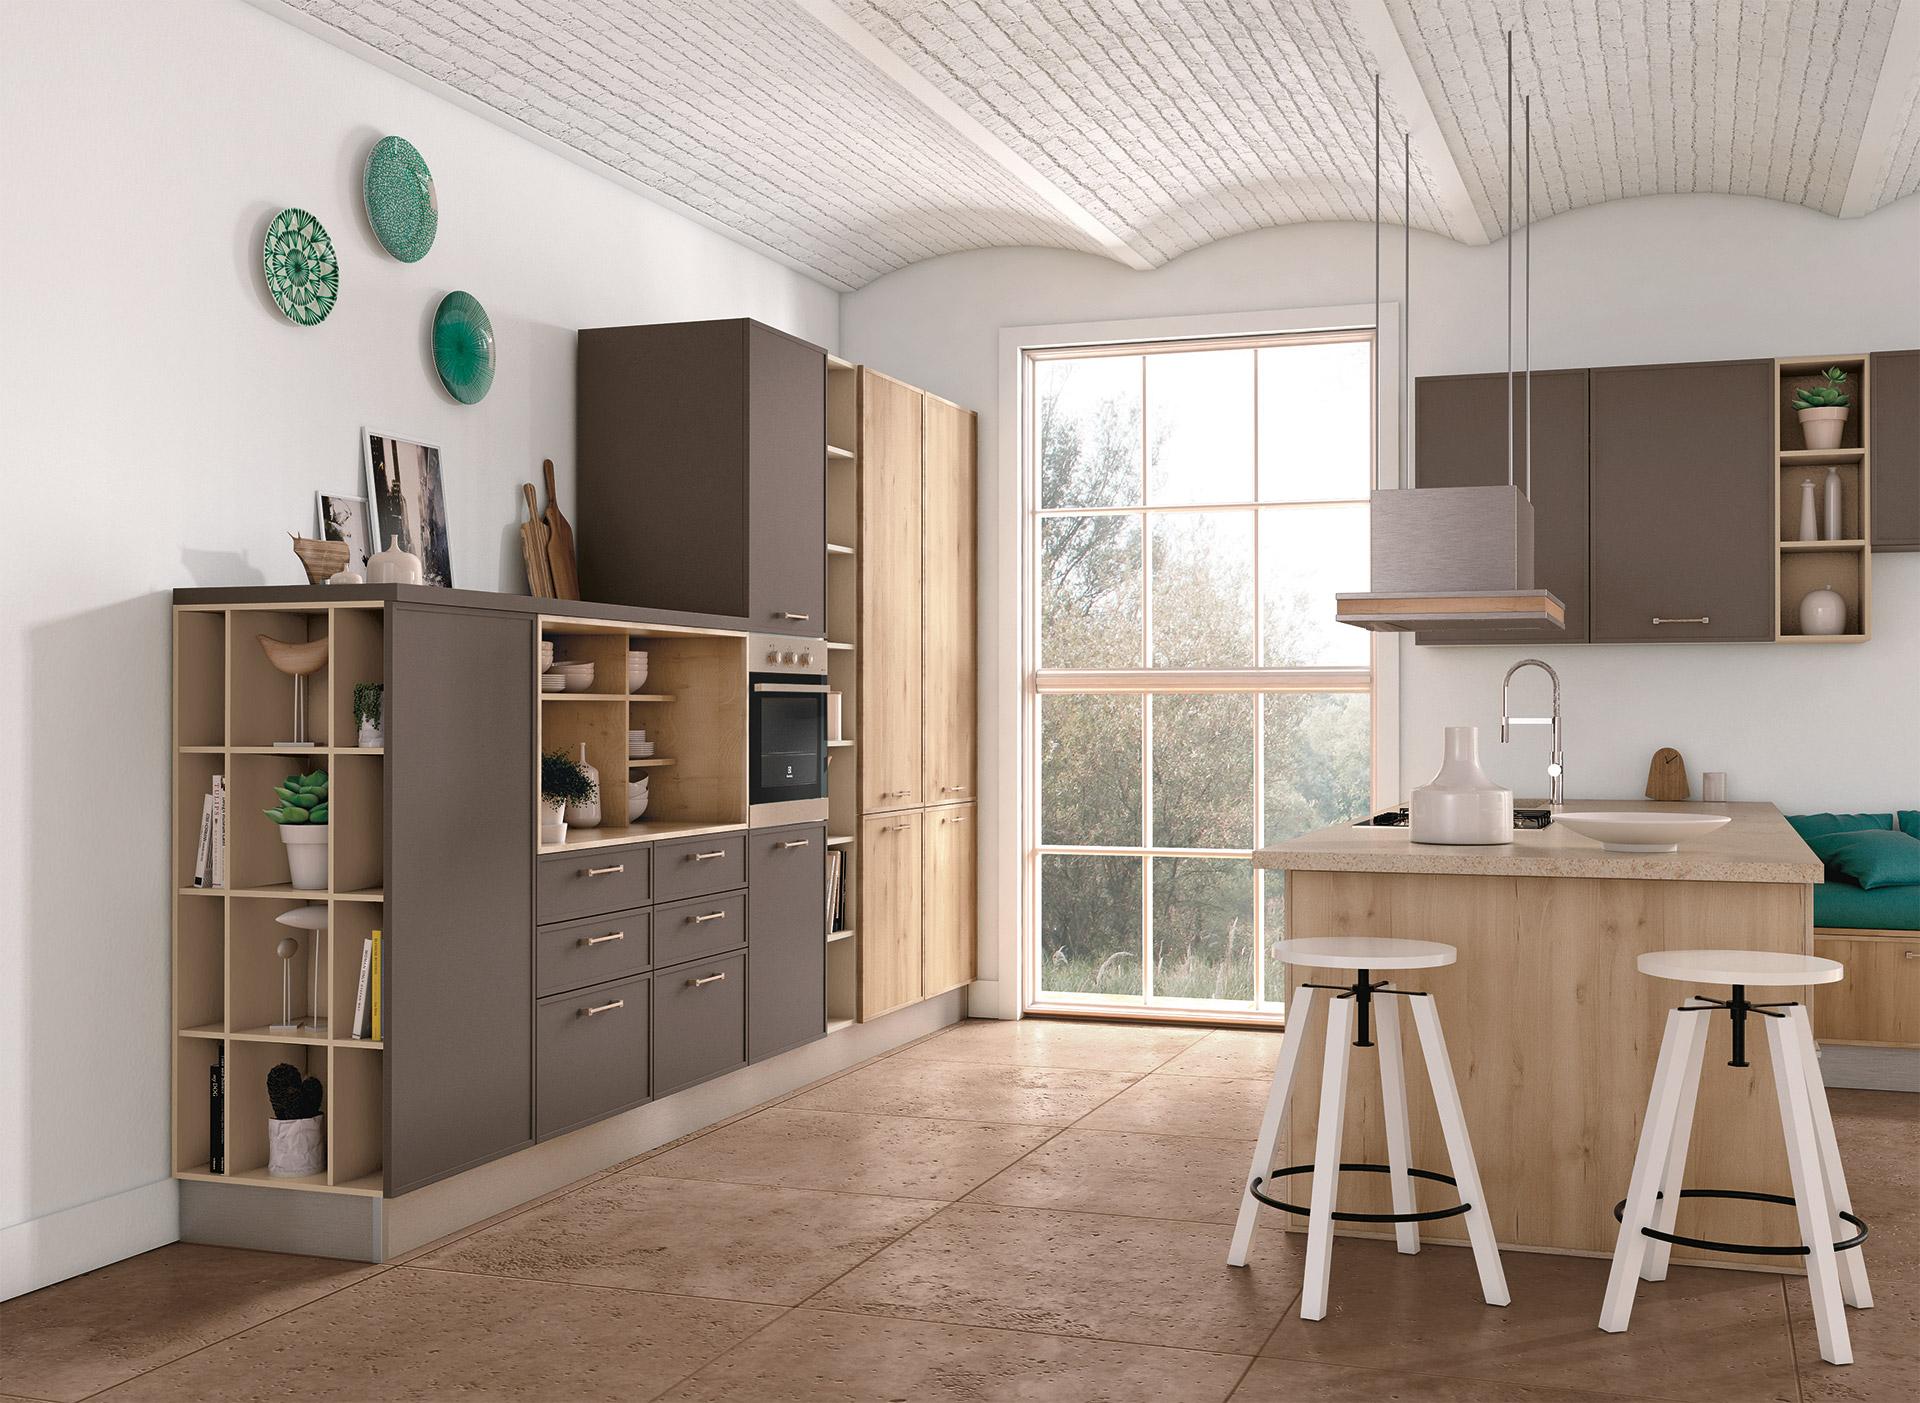 In cucina… non solo sedie! | Arredare la cucina